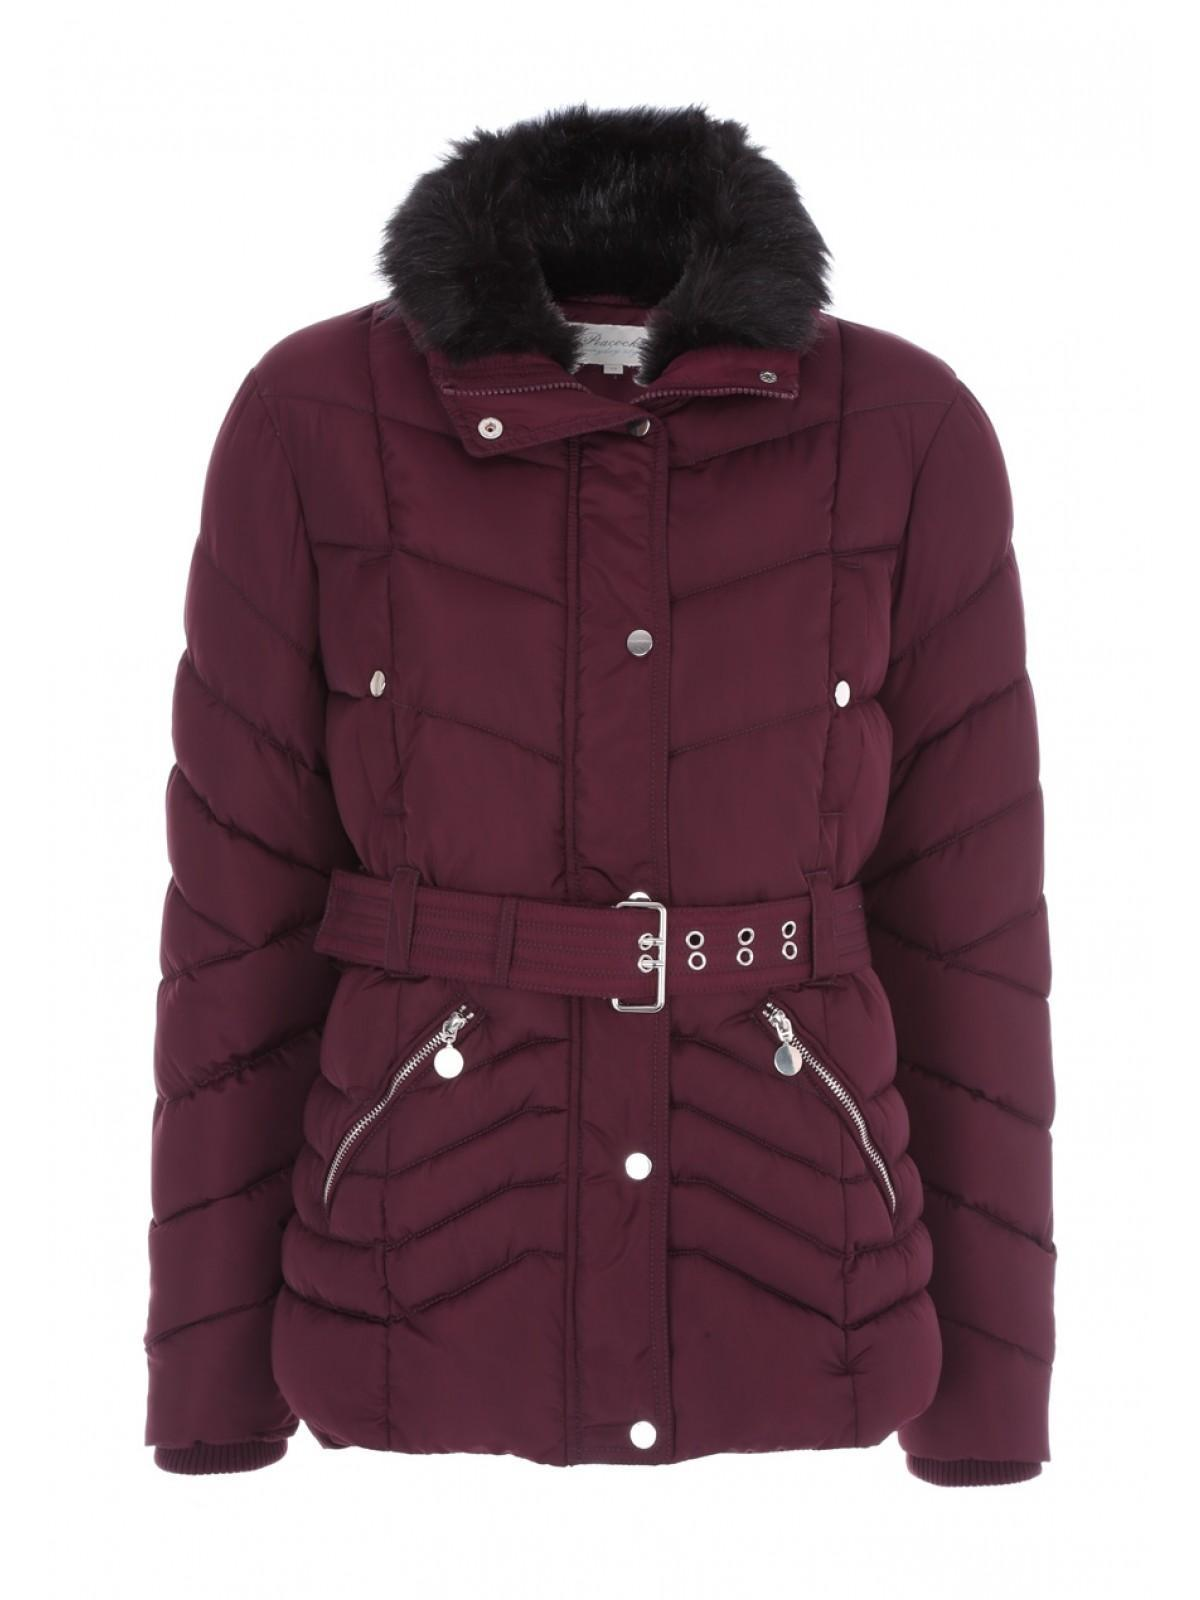 Women's Coats & Jackets - Blazers & Denim Jackets | Peacocks ...